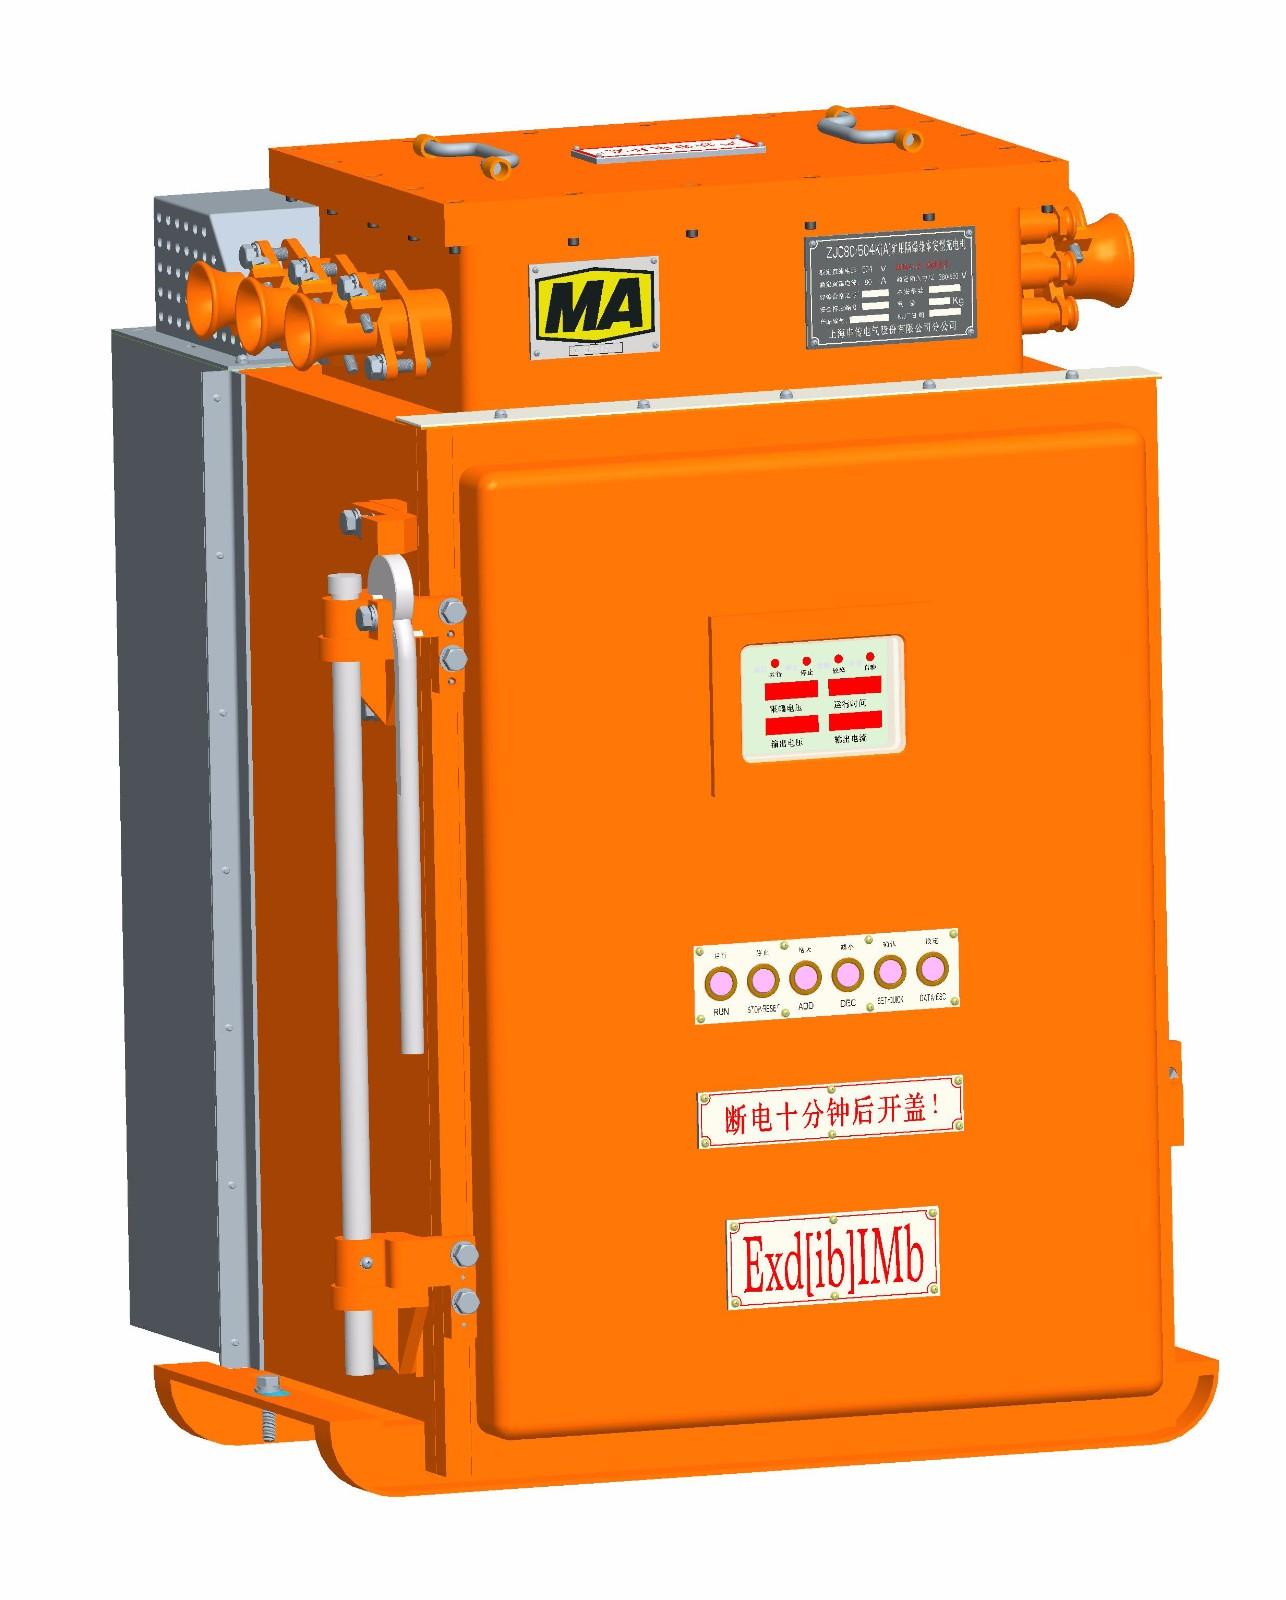 ZJC100/400K(A)、 ZJC80/504 K(A)矿用隔爆兼本安型充电机